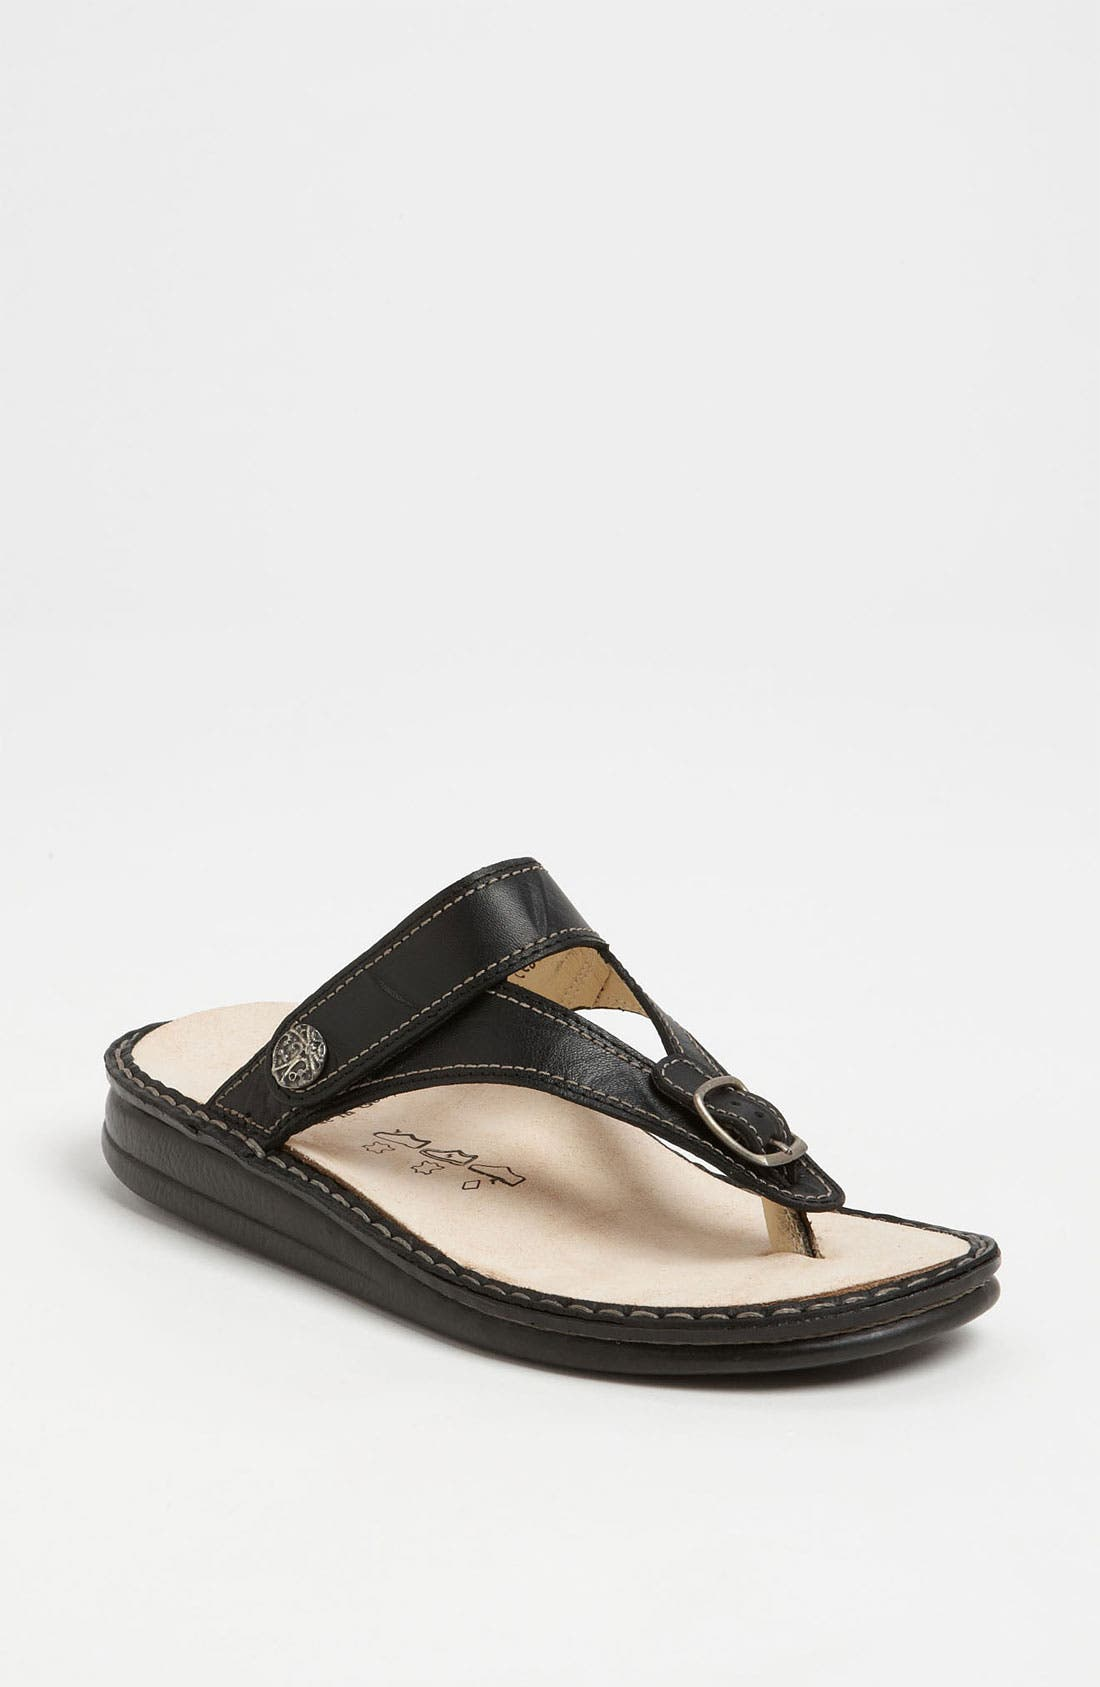 FINN COMFORT 'Alexandria' Thong Sandal